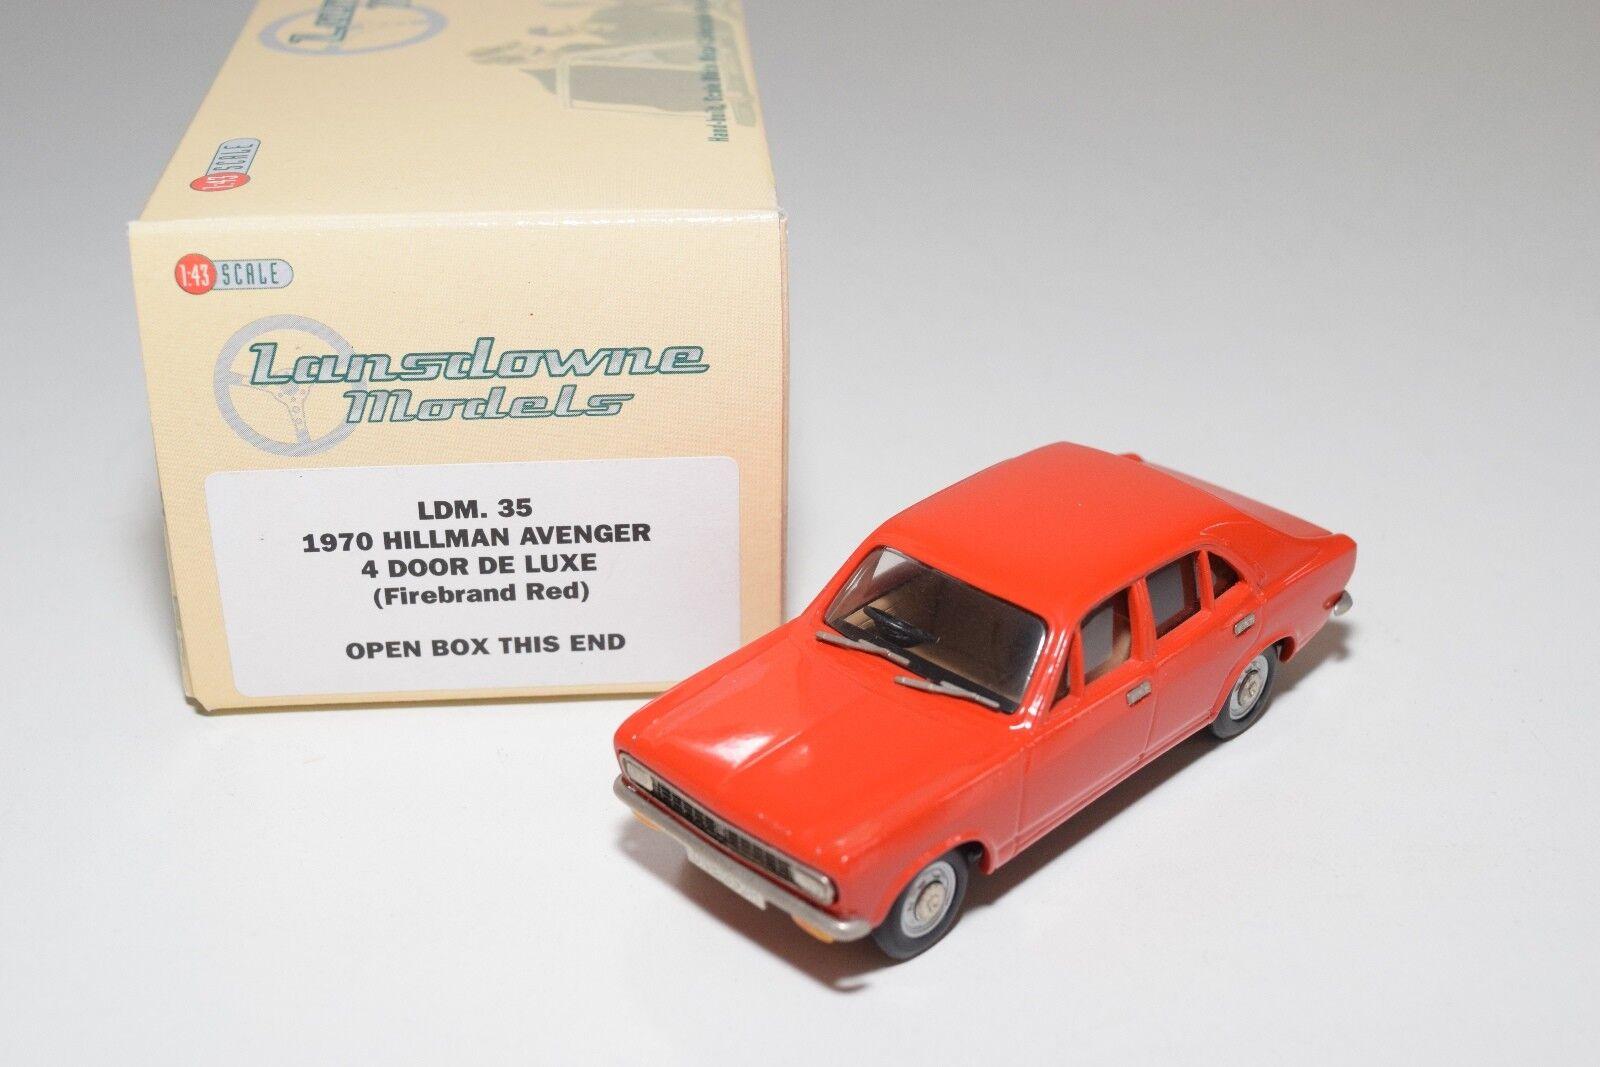 LANSDOWNE MODELS LDM 35 1970 HILLMAN AVENGER 4 DOOR DE LUXE rouge MINT BOXED